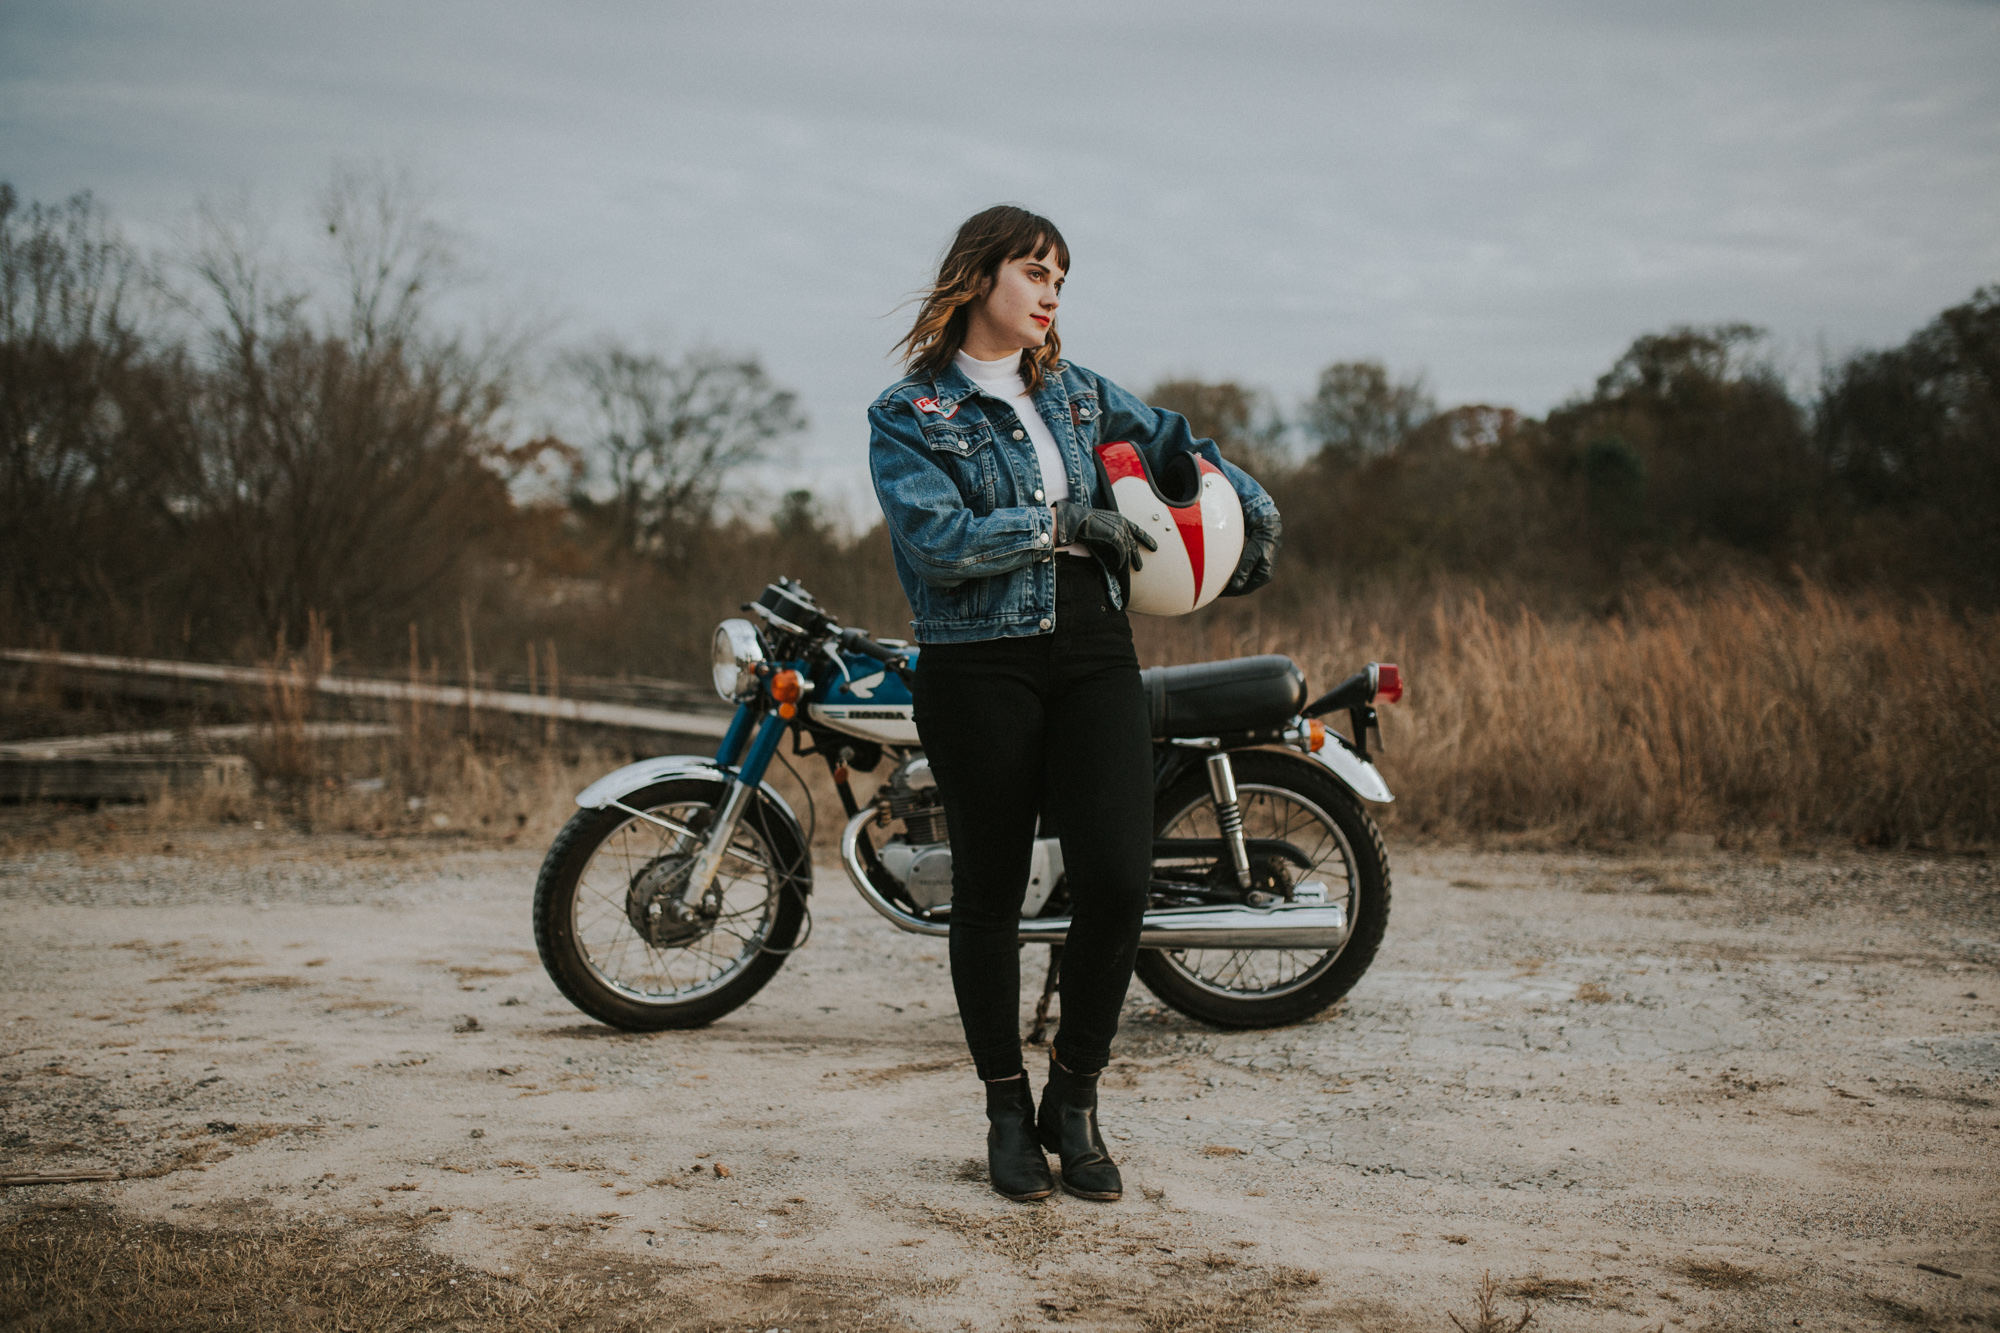 honda-motorcycle-atlanta.jpg